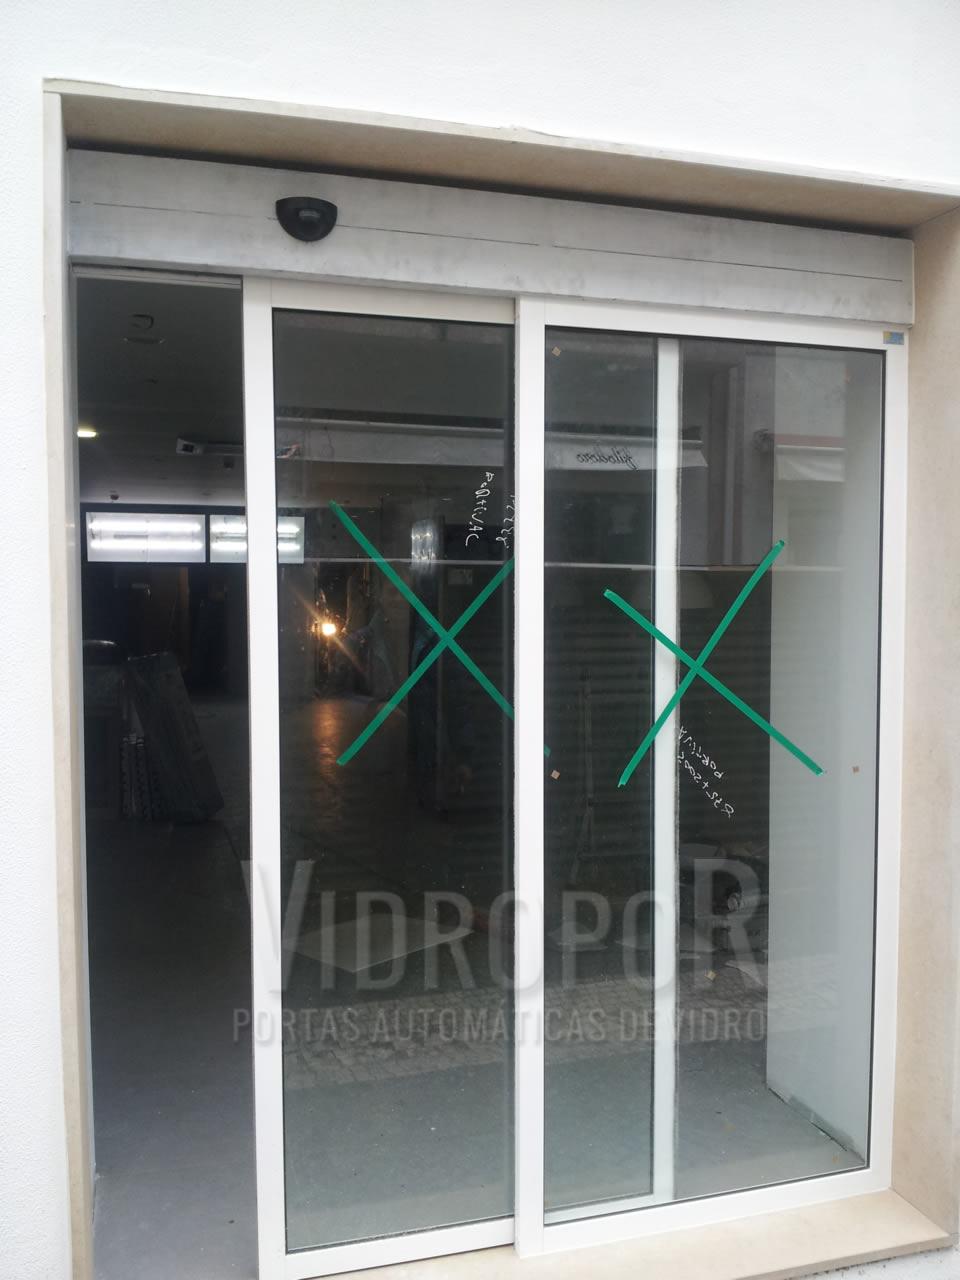 Porta automática de vidro perfis cor branco com sistema anti-entalamento.